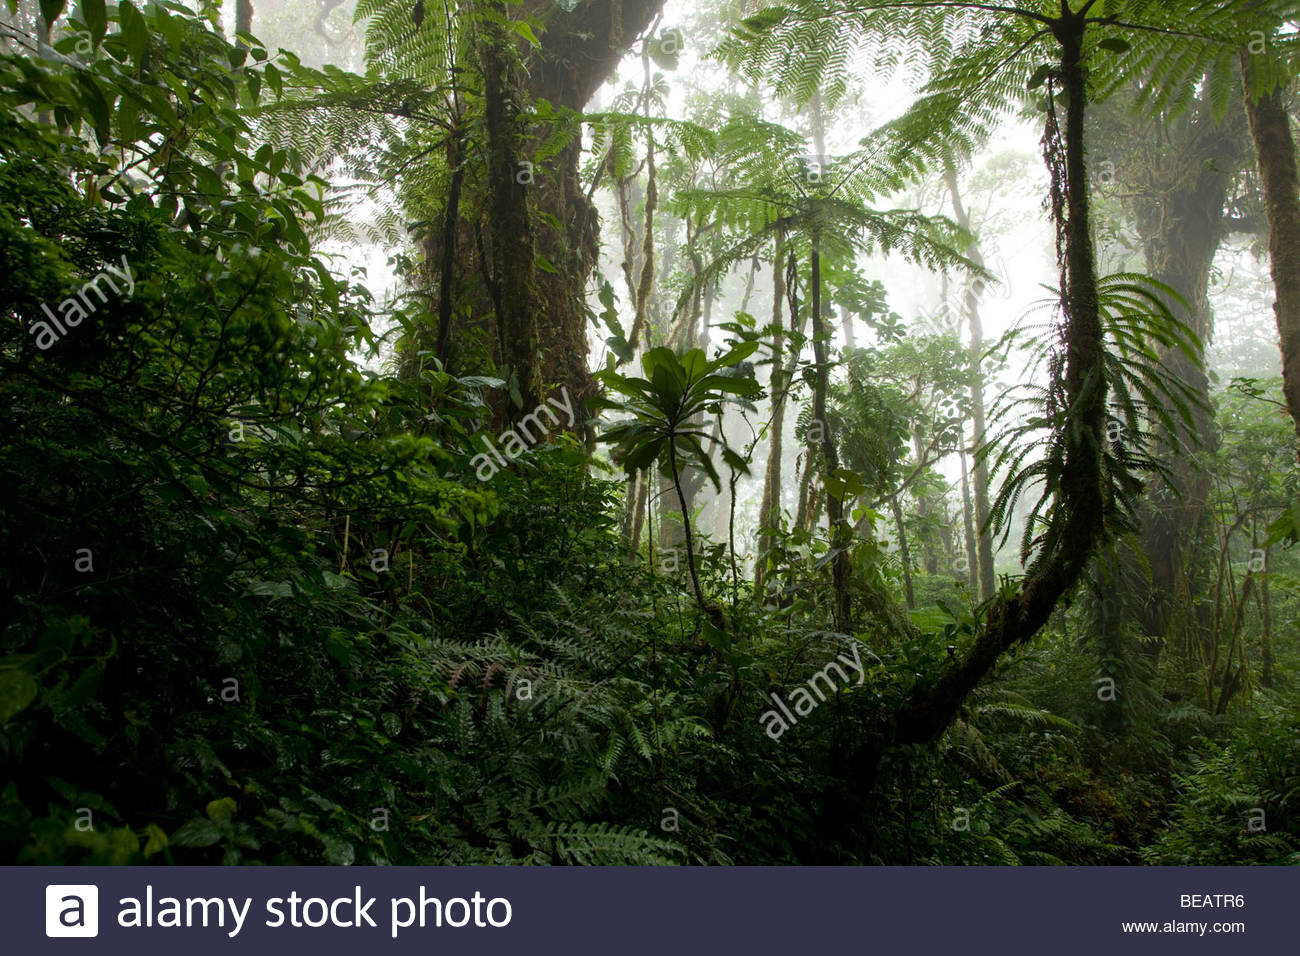 Santa Elena Biological Reserve, Costa Rica - Stock Image